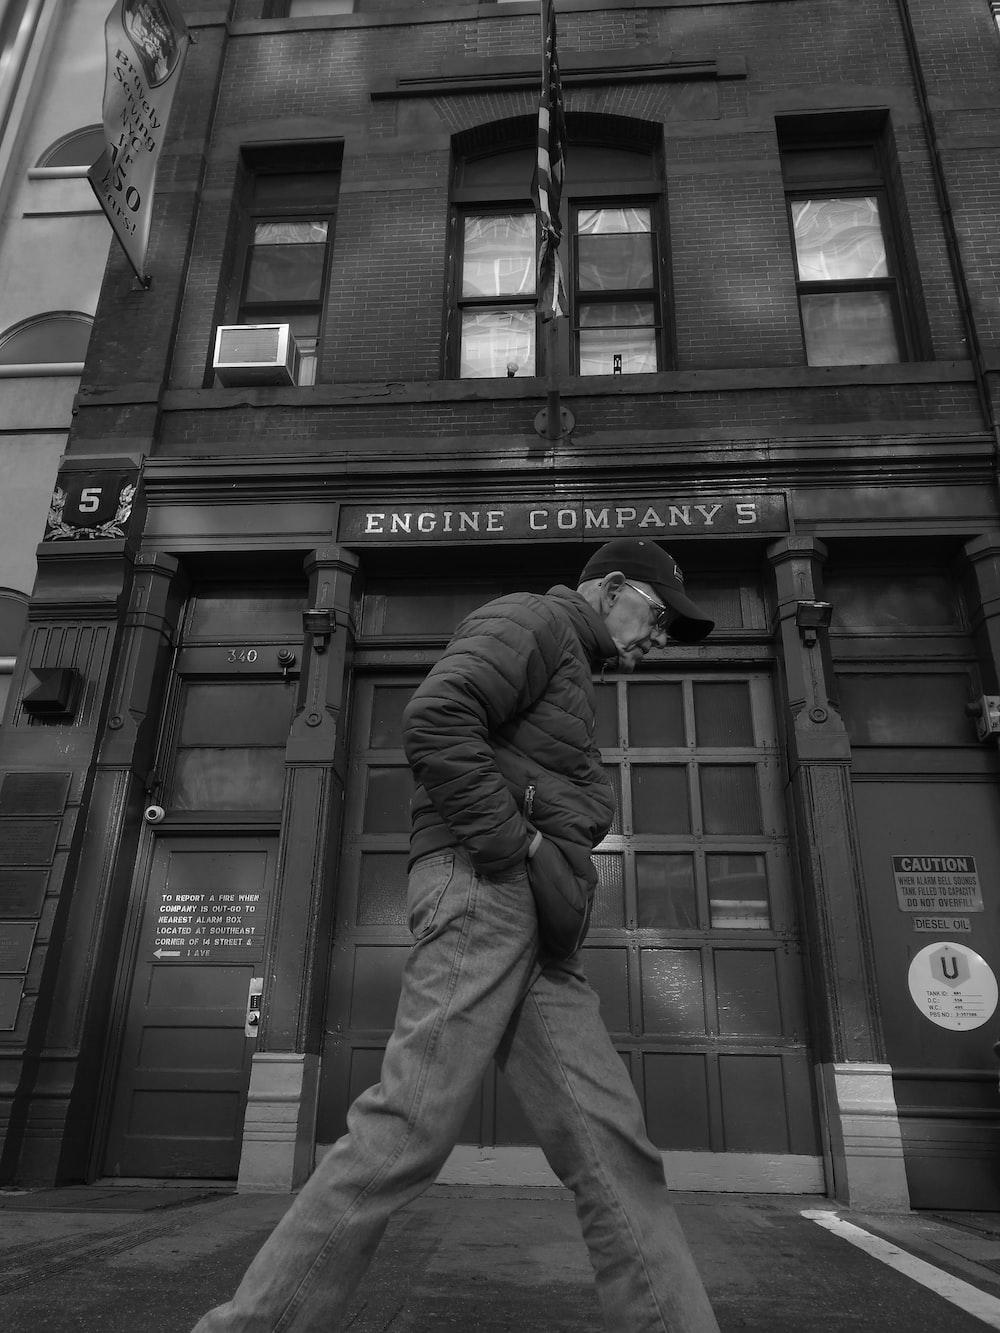 greyscale photo of man walking near Engine Company building